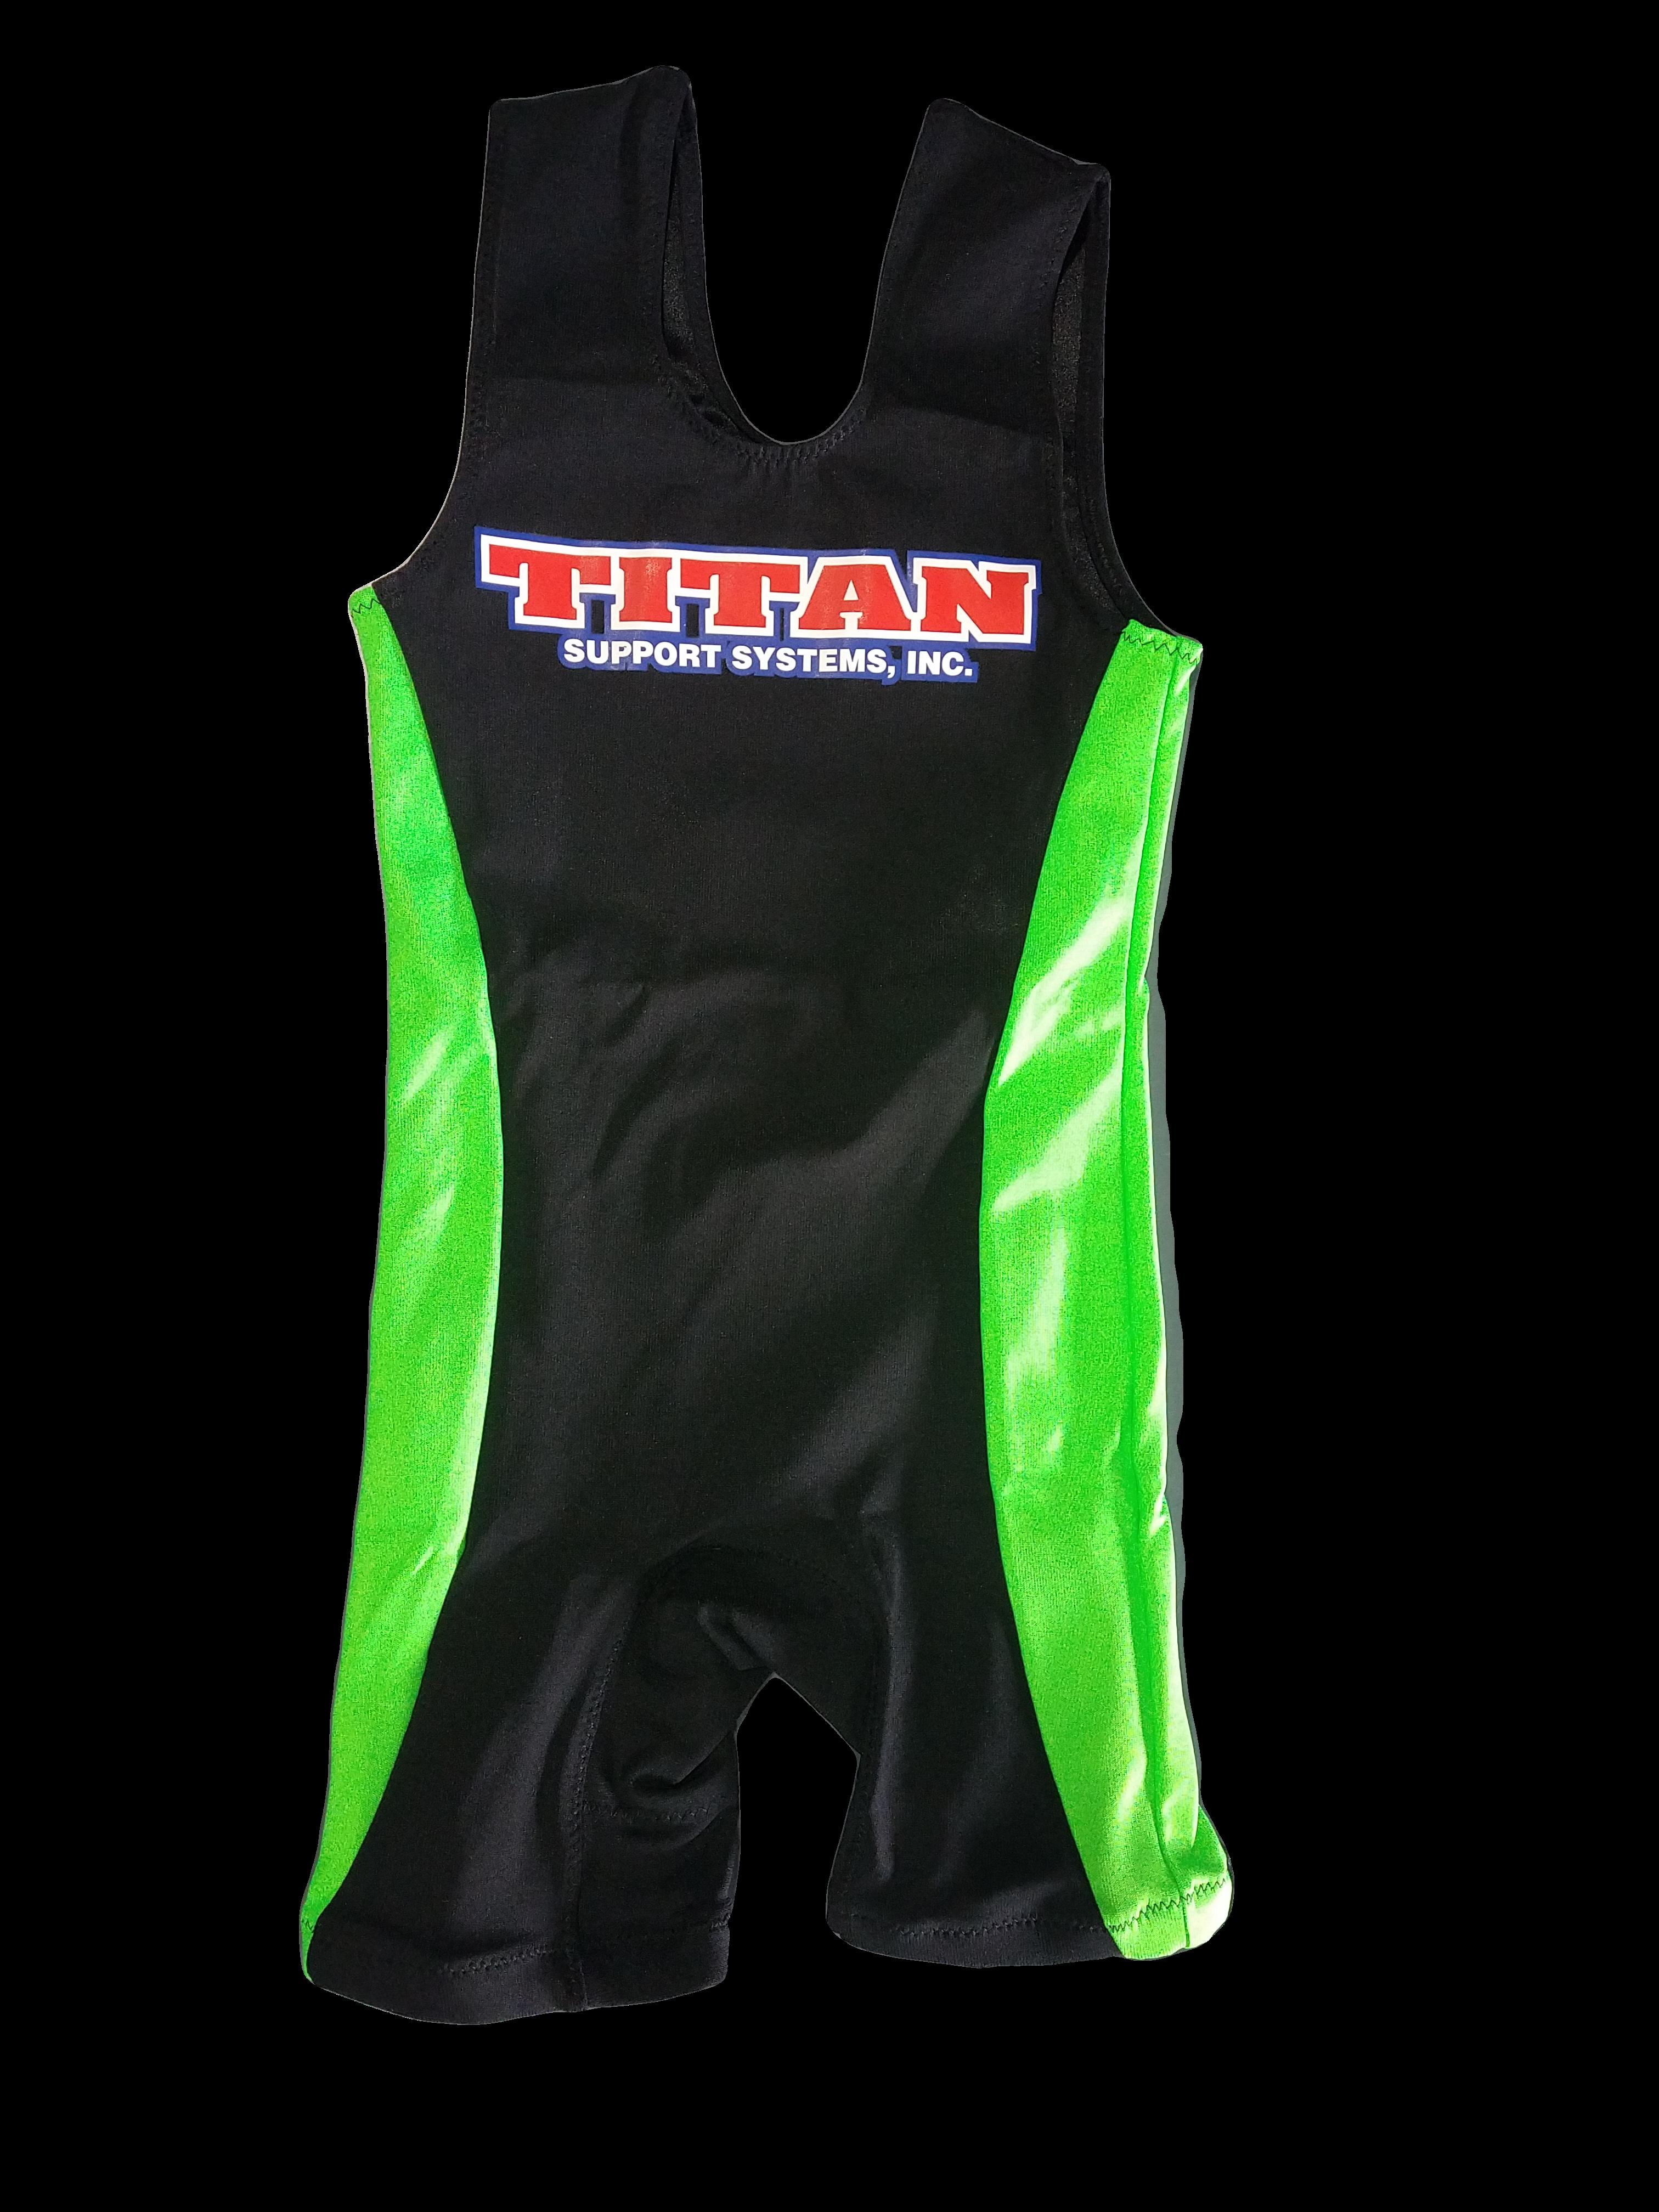 Titan Triumph Powerlifting Singlet Ipf Usapl Uspa Ipl Legal For Raw Powerlifting